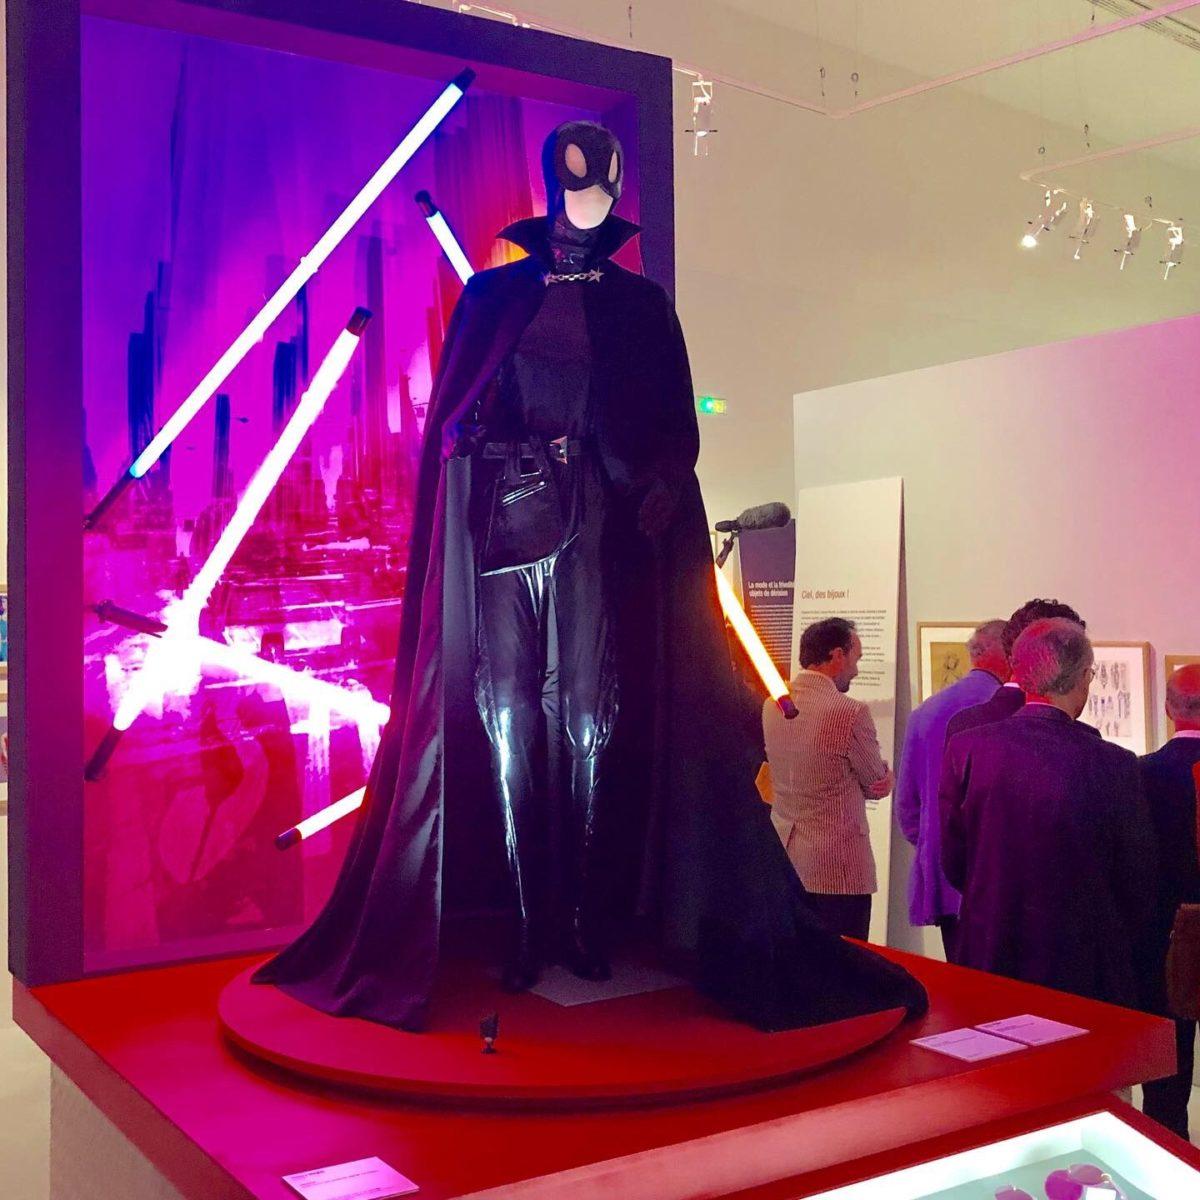 exposition mode et bande dessinée catwoman de mugler